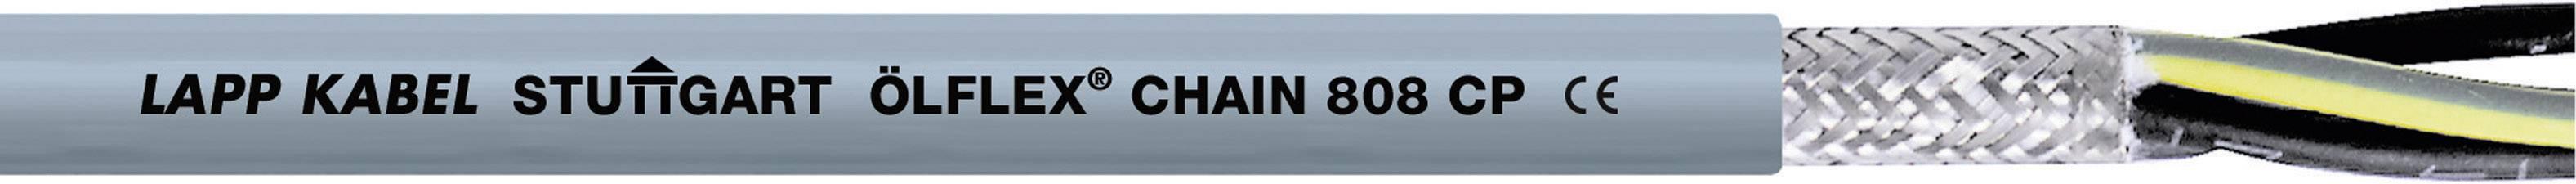 Žíla kabelu LappKabel ÖLFLEX CHAIN 808 CP 12G0,75 (1027764), 12x 0,75 mm², polyurethan, Ø 10,9 mm, stíněný, 50